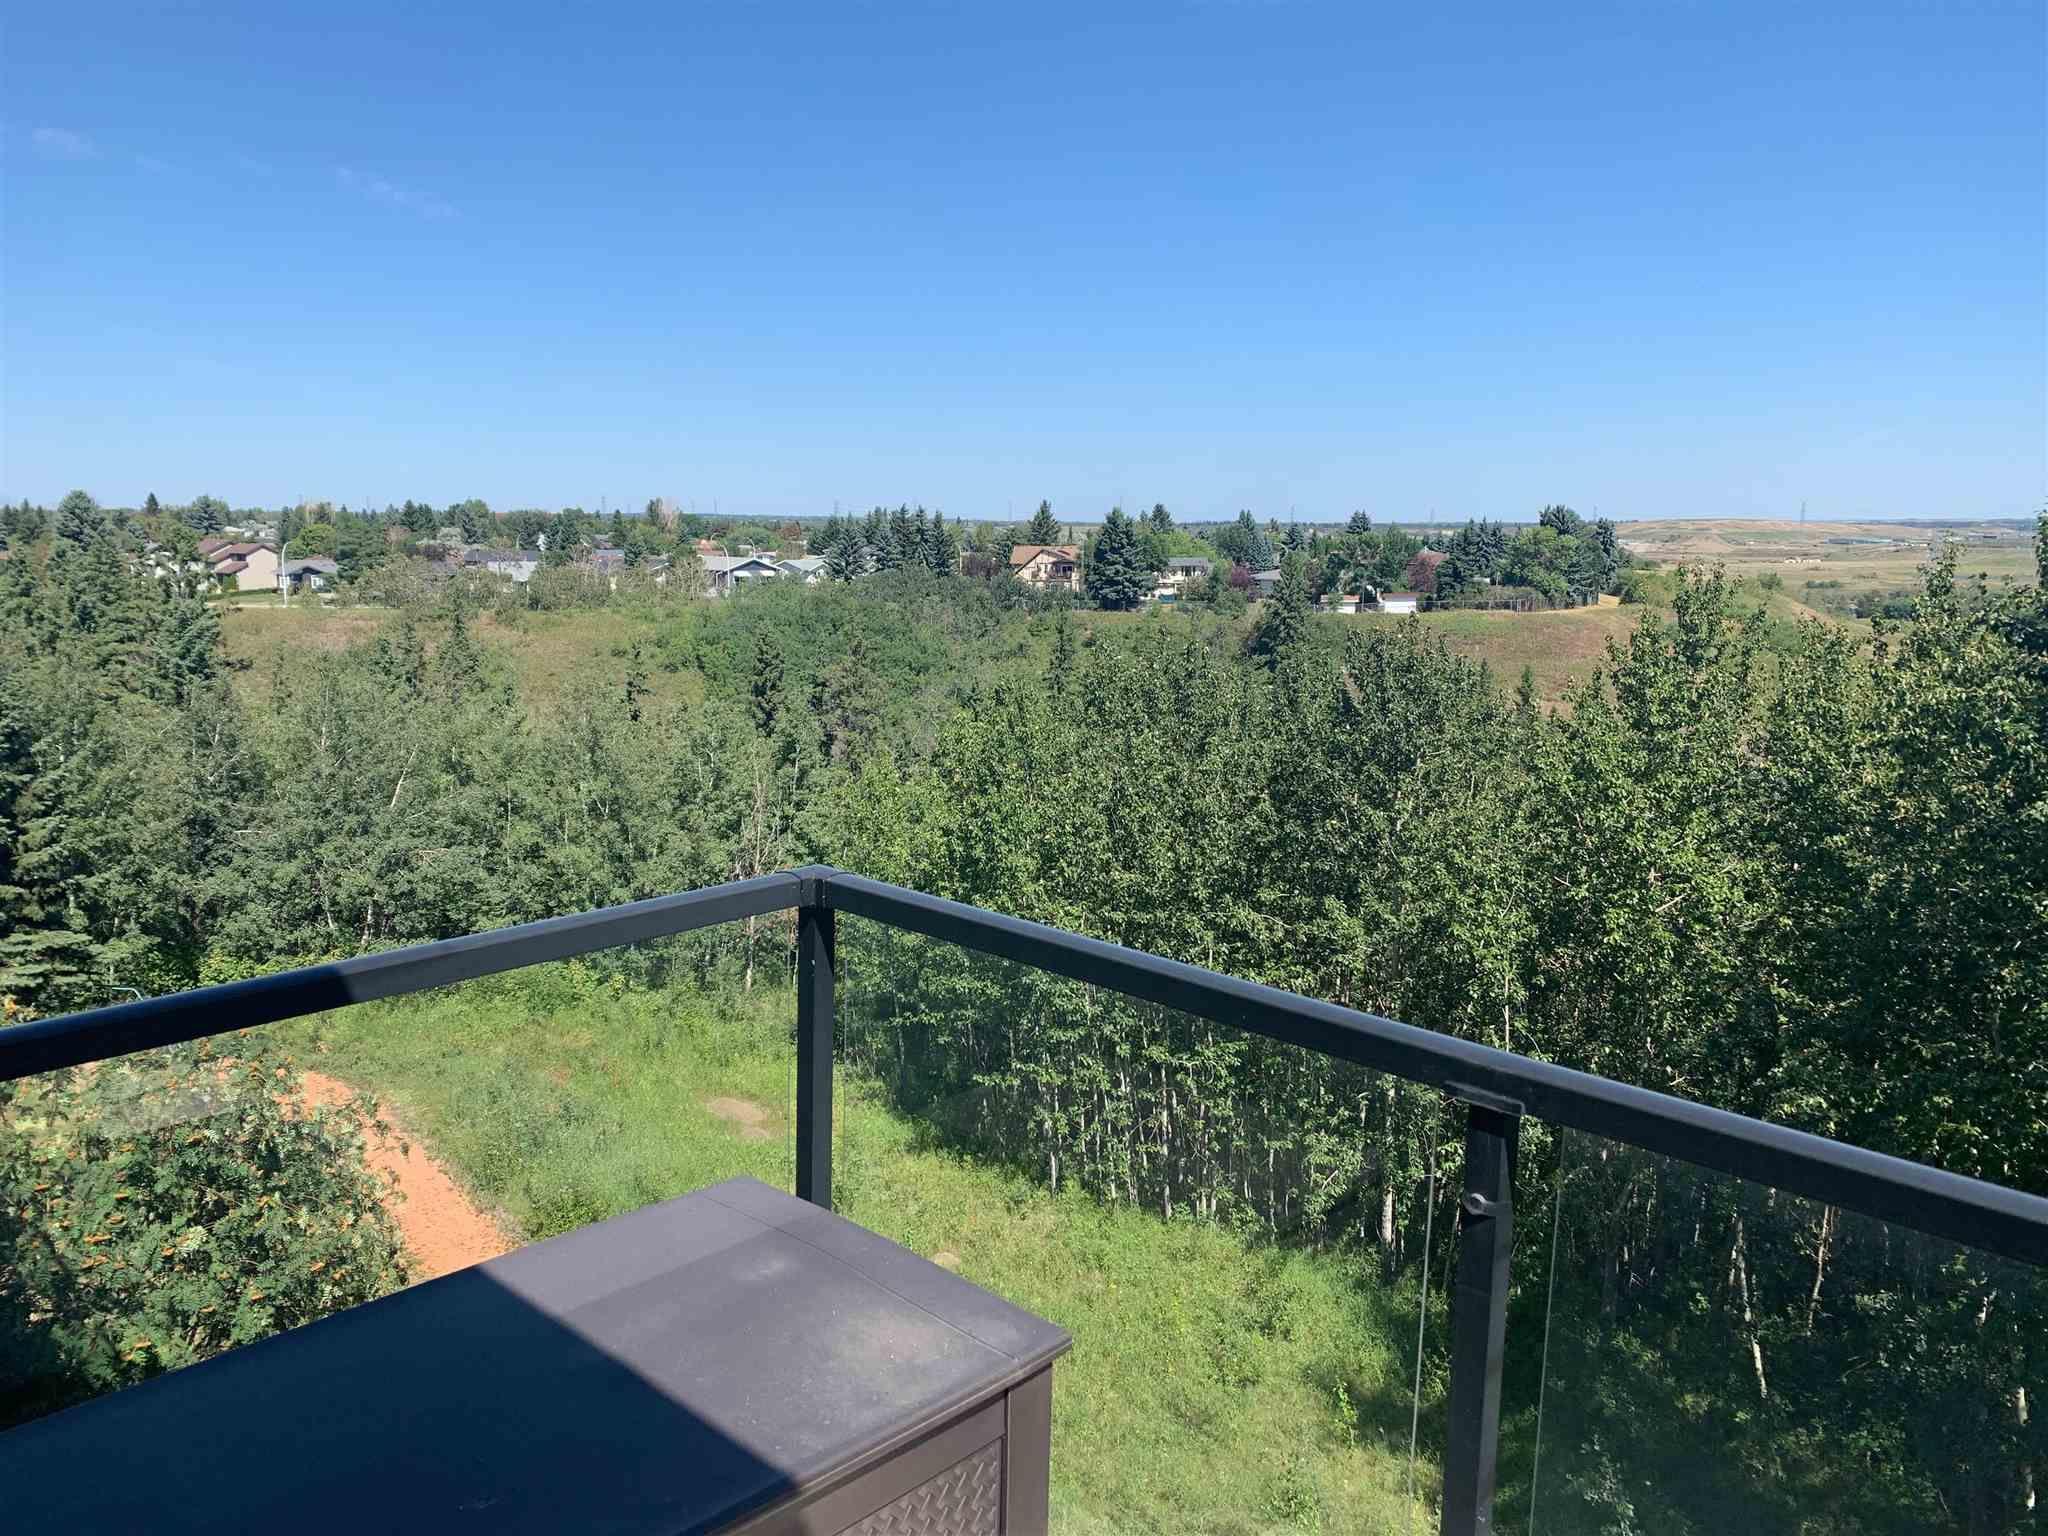 Main Photo: 420 592 HOOKE Road NW in Edmonton: Zone 35 Condo for sale : MLS®# E4258198